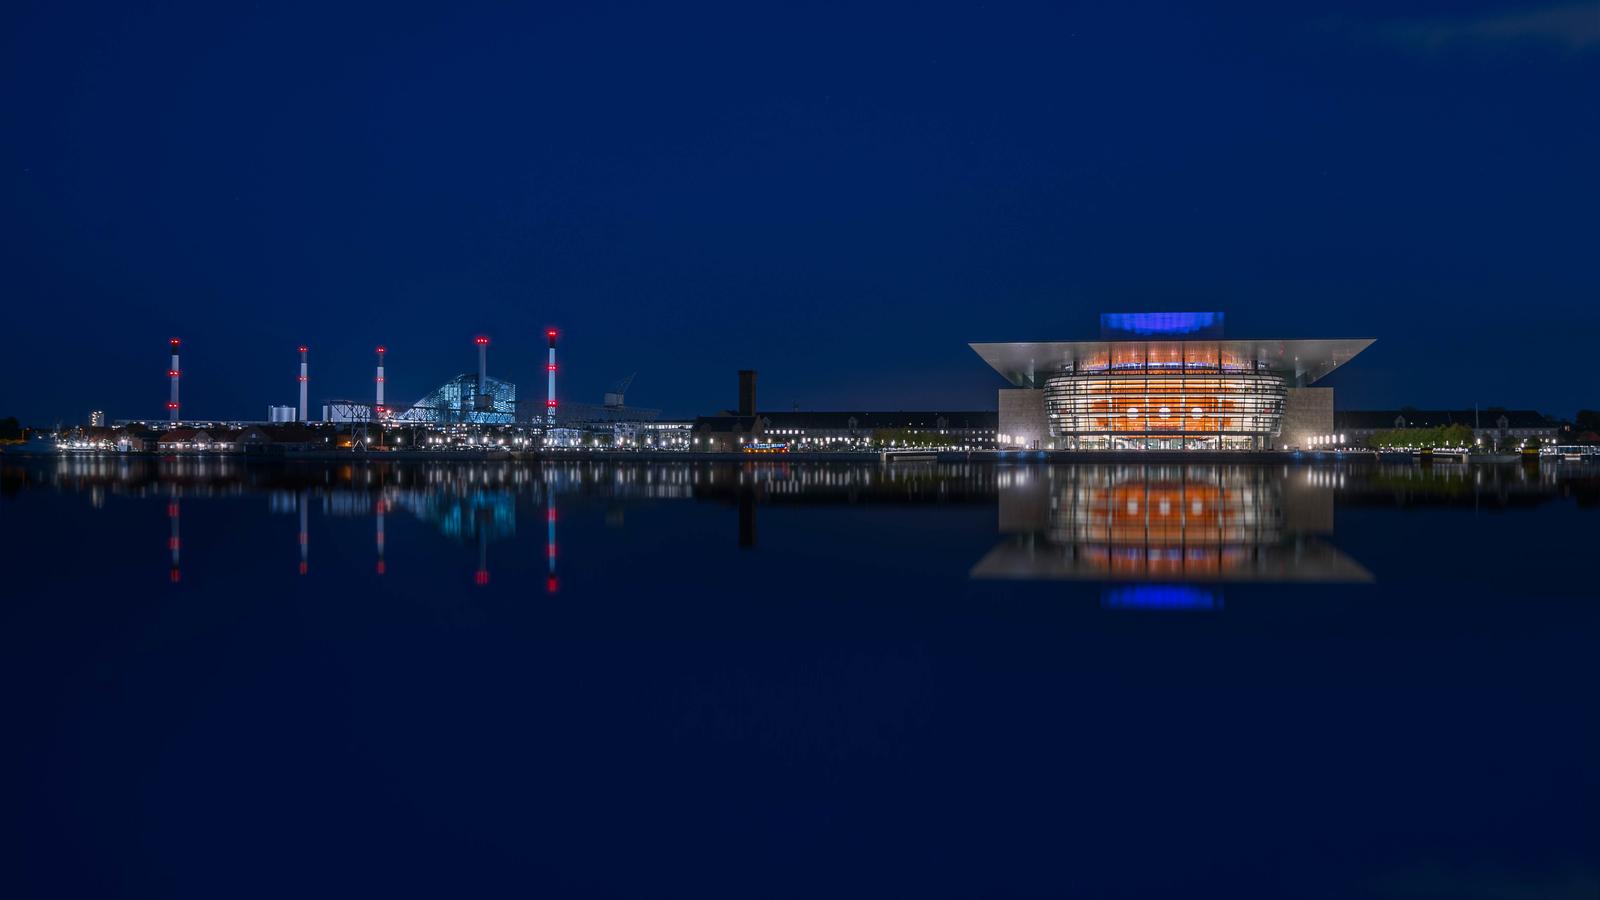 The Opera House at night in Copenhagen, Denmark